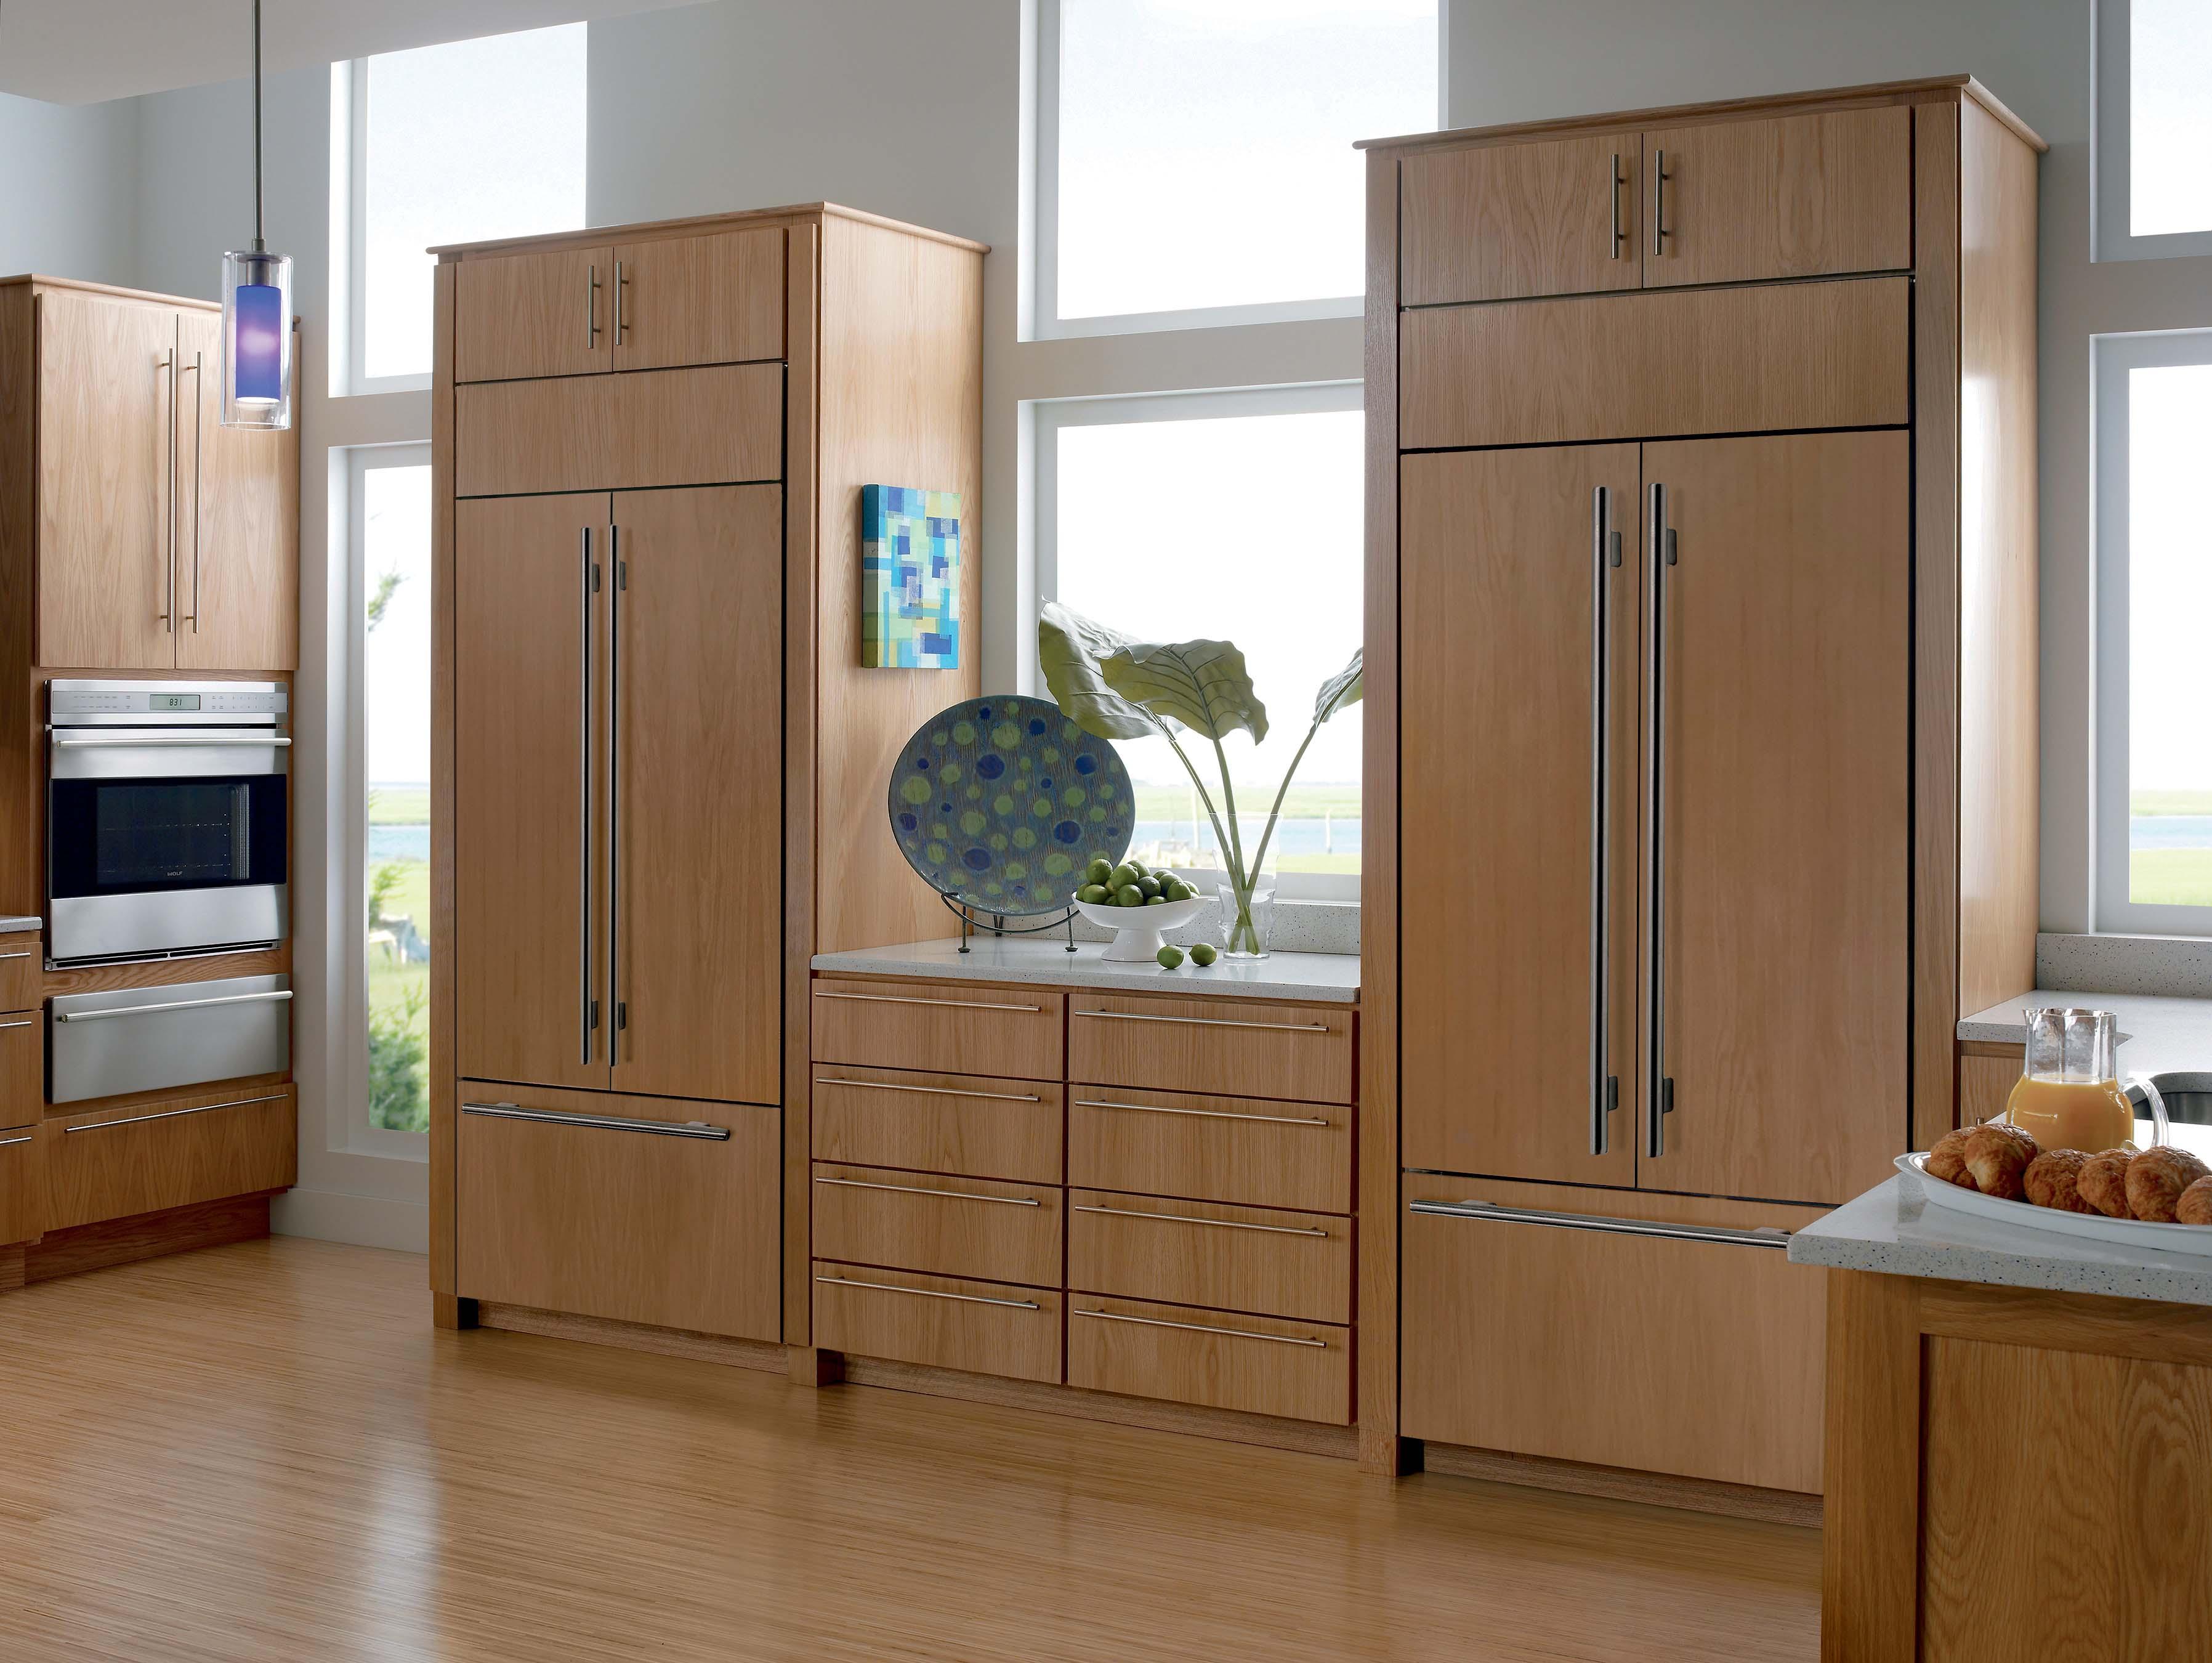 transitional project kitchens drawers freezer zero to inspire your next prado the sub